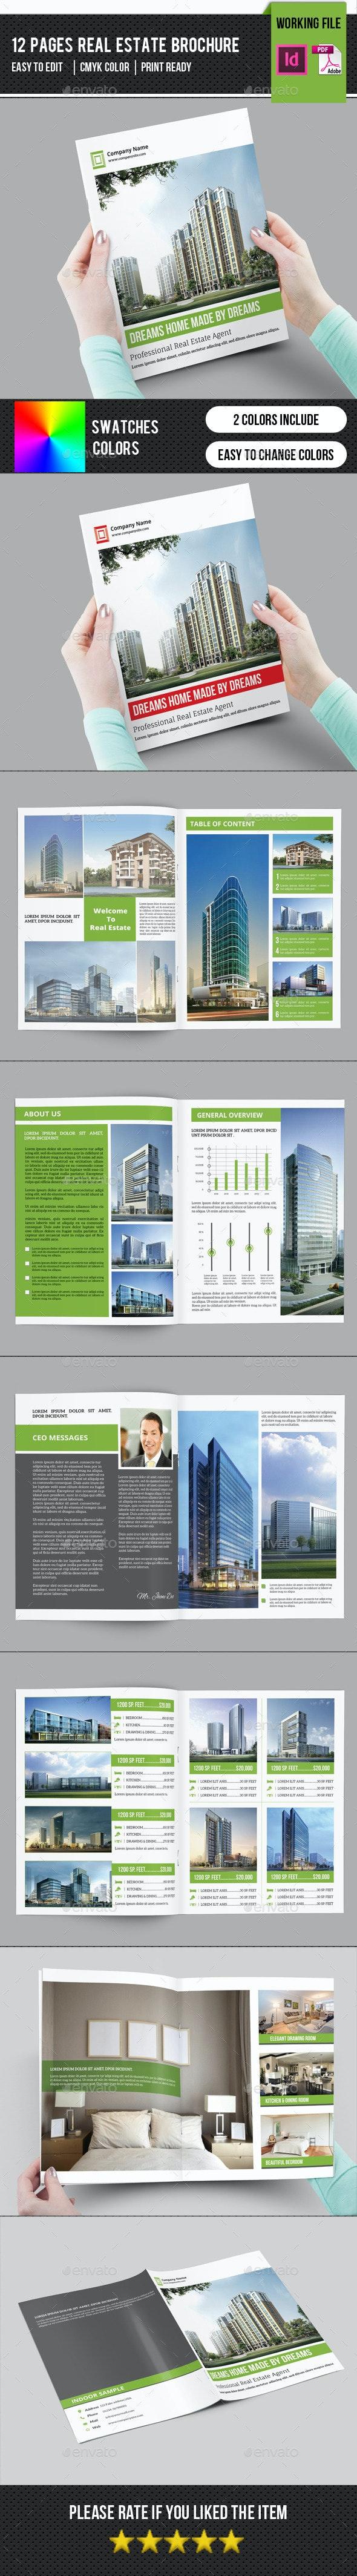 Real Estate Brochure Template-V304 - Catalogs Brochures